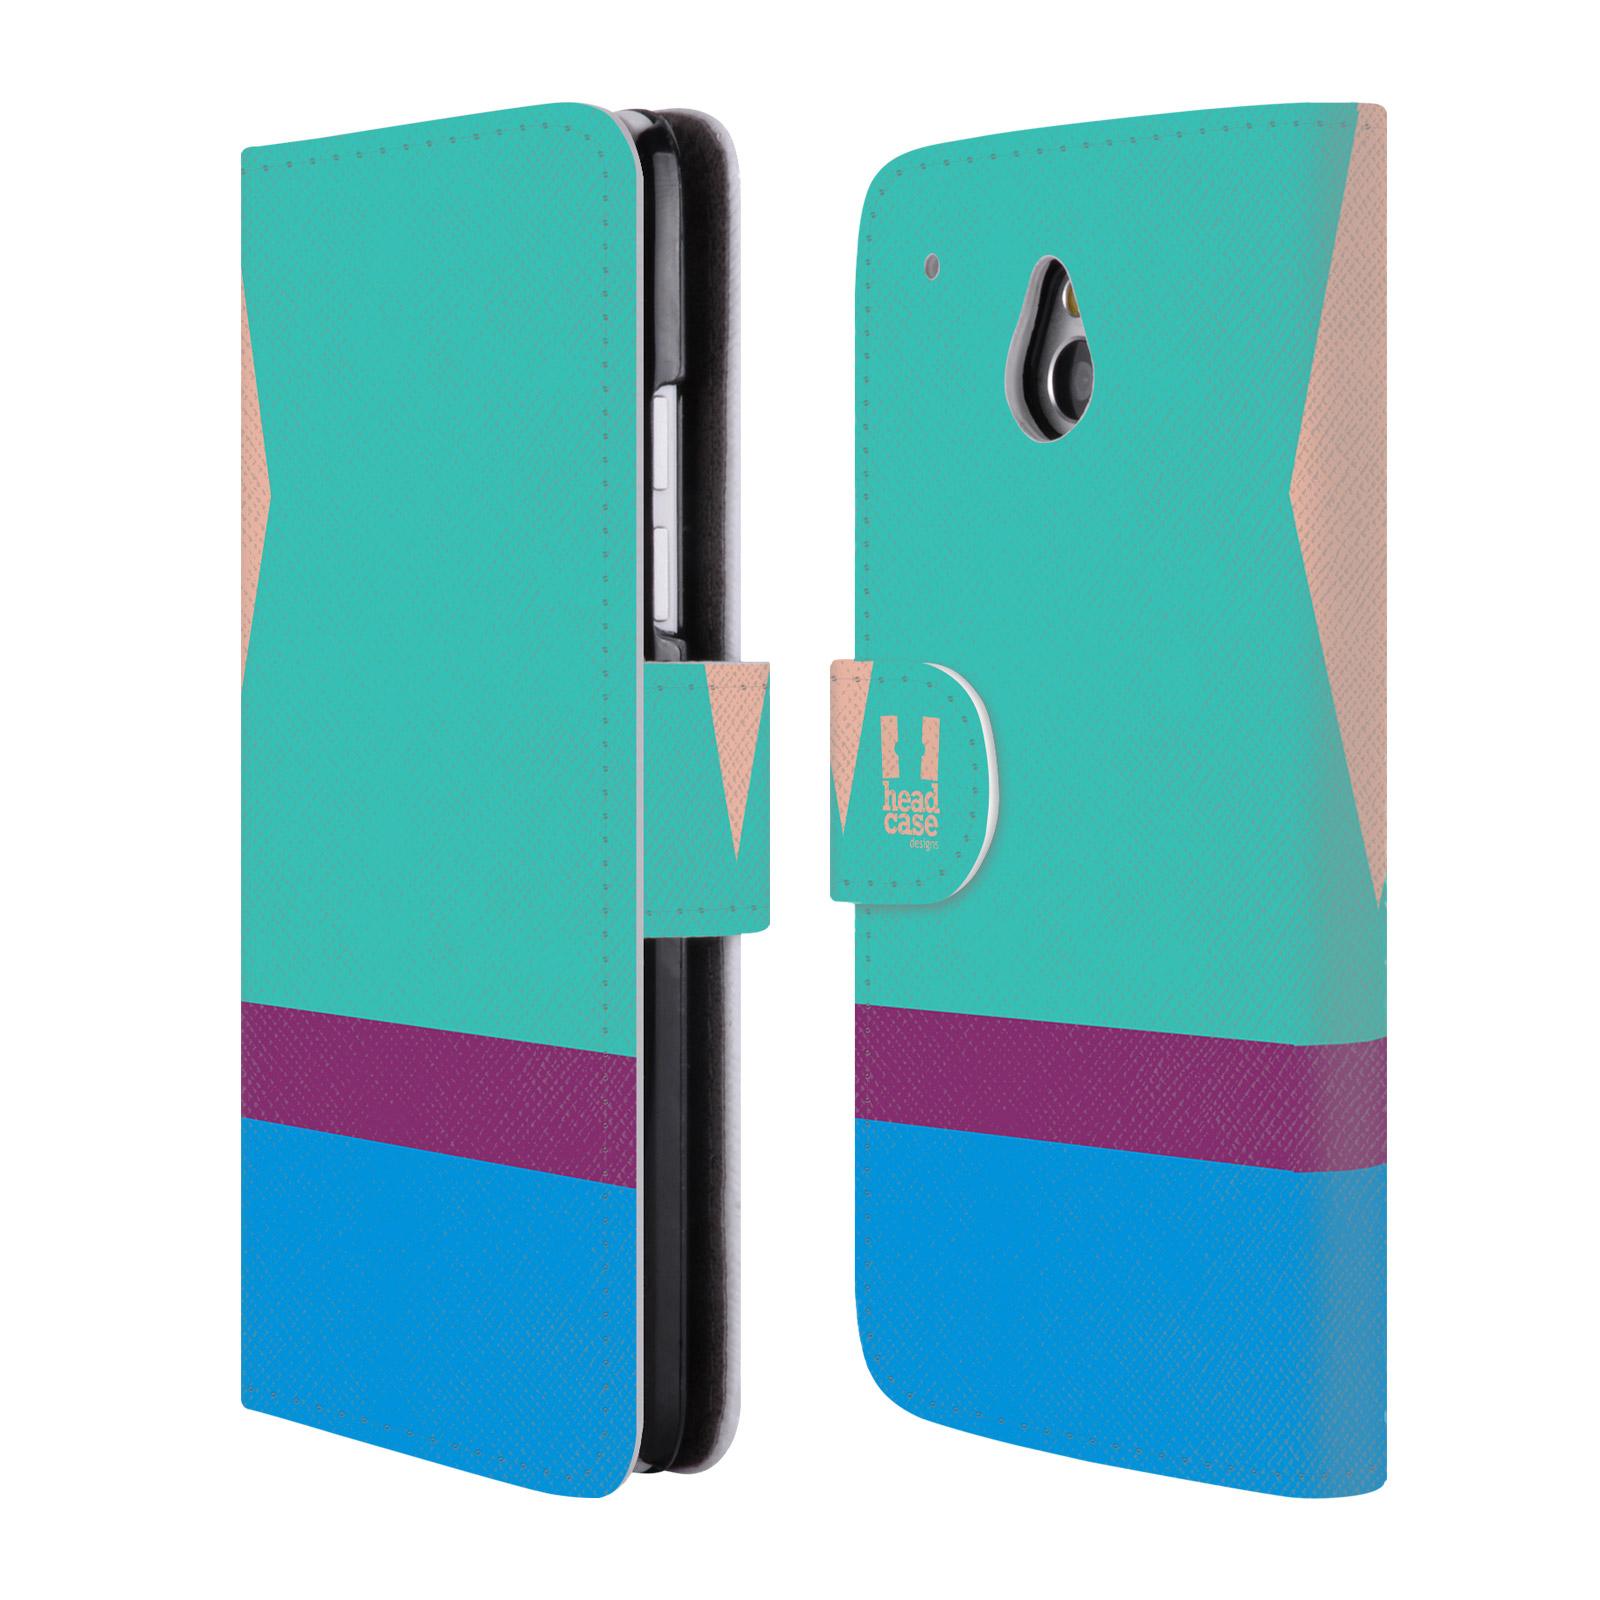 HEAD CASE Flipové pouzdro pro mobil HTC ONE MINI barevné tvary modrá a fialový pruh